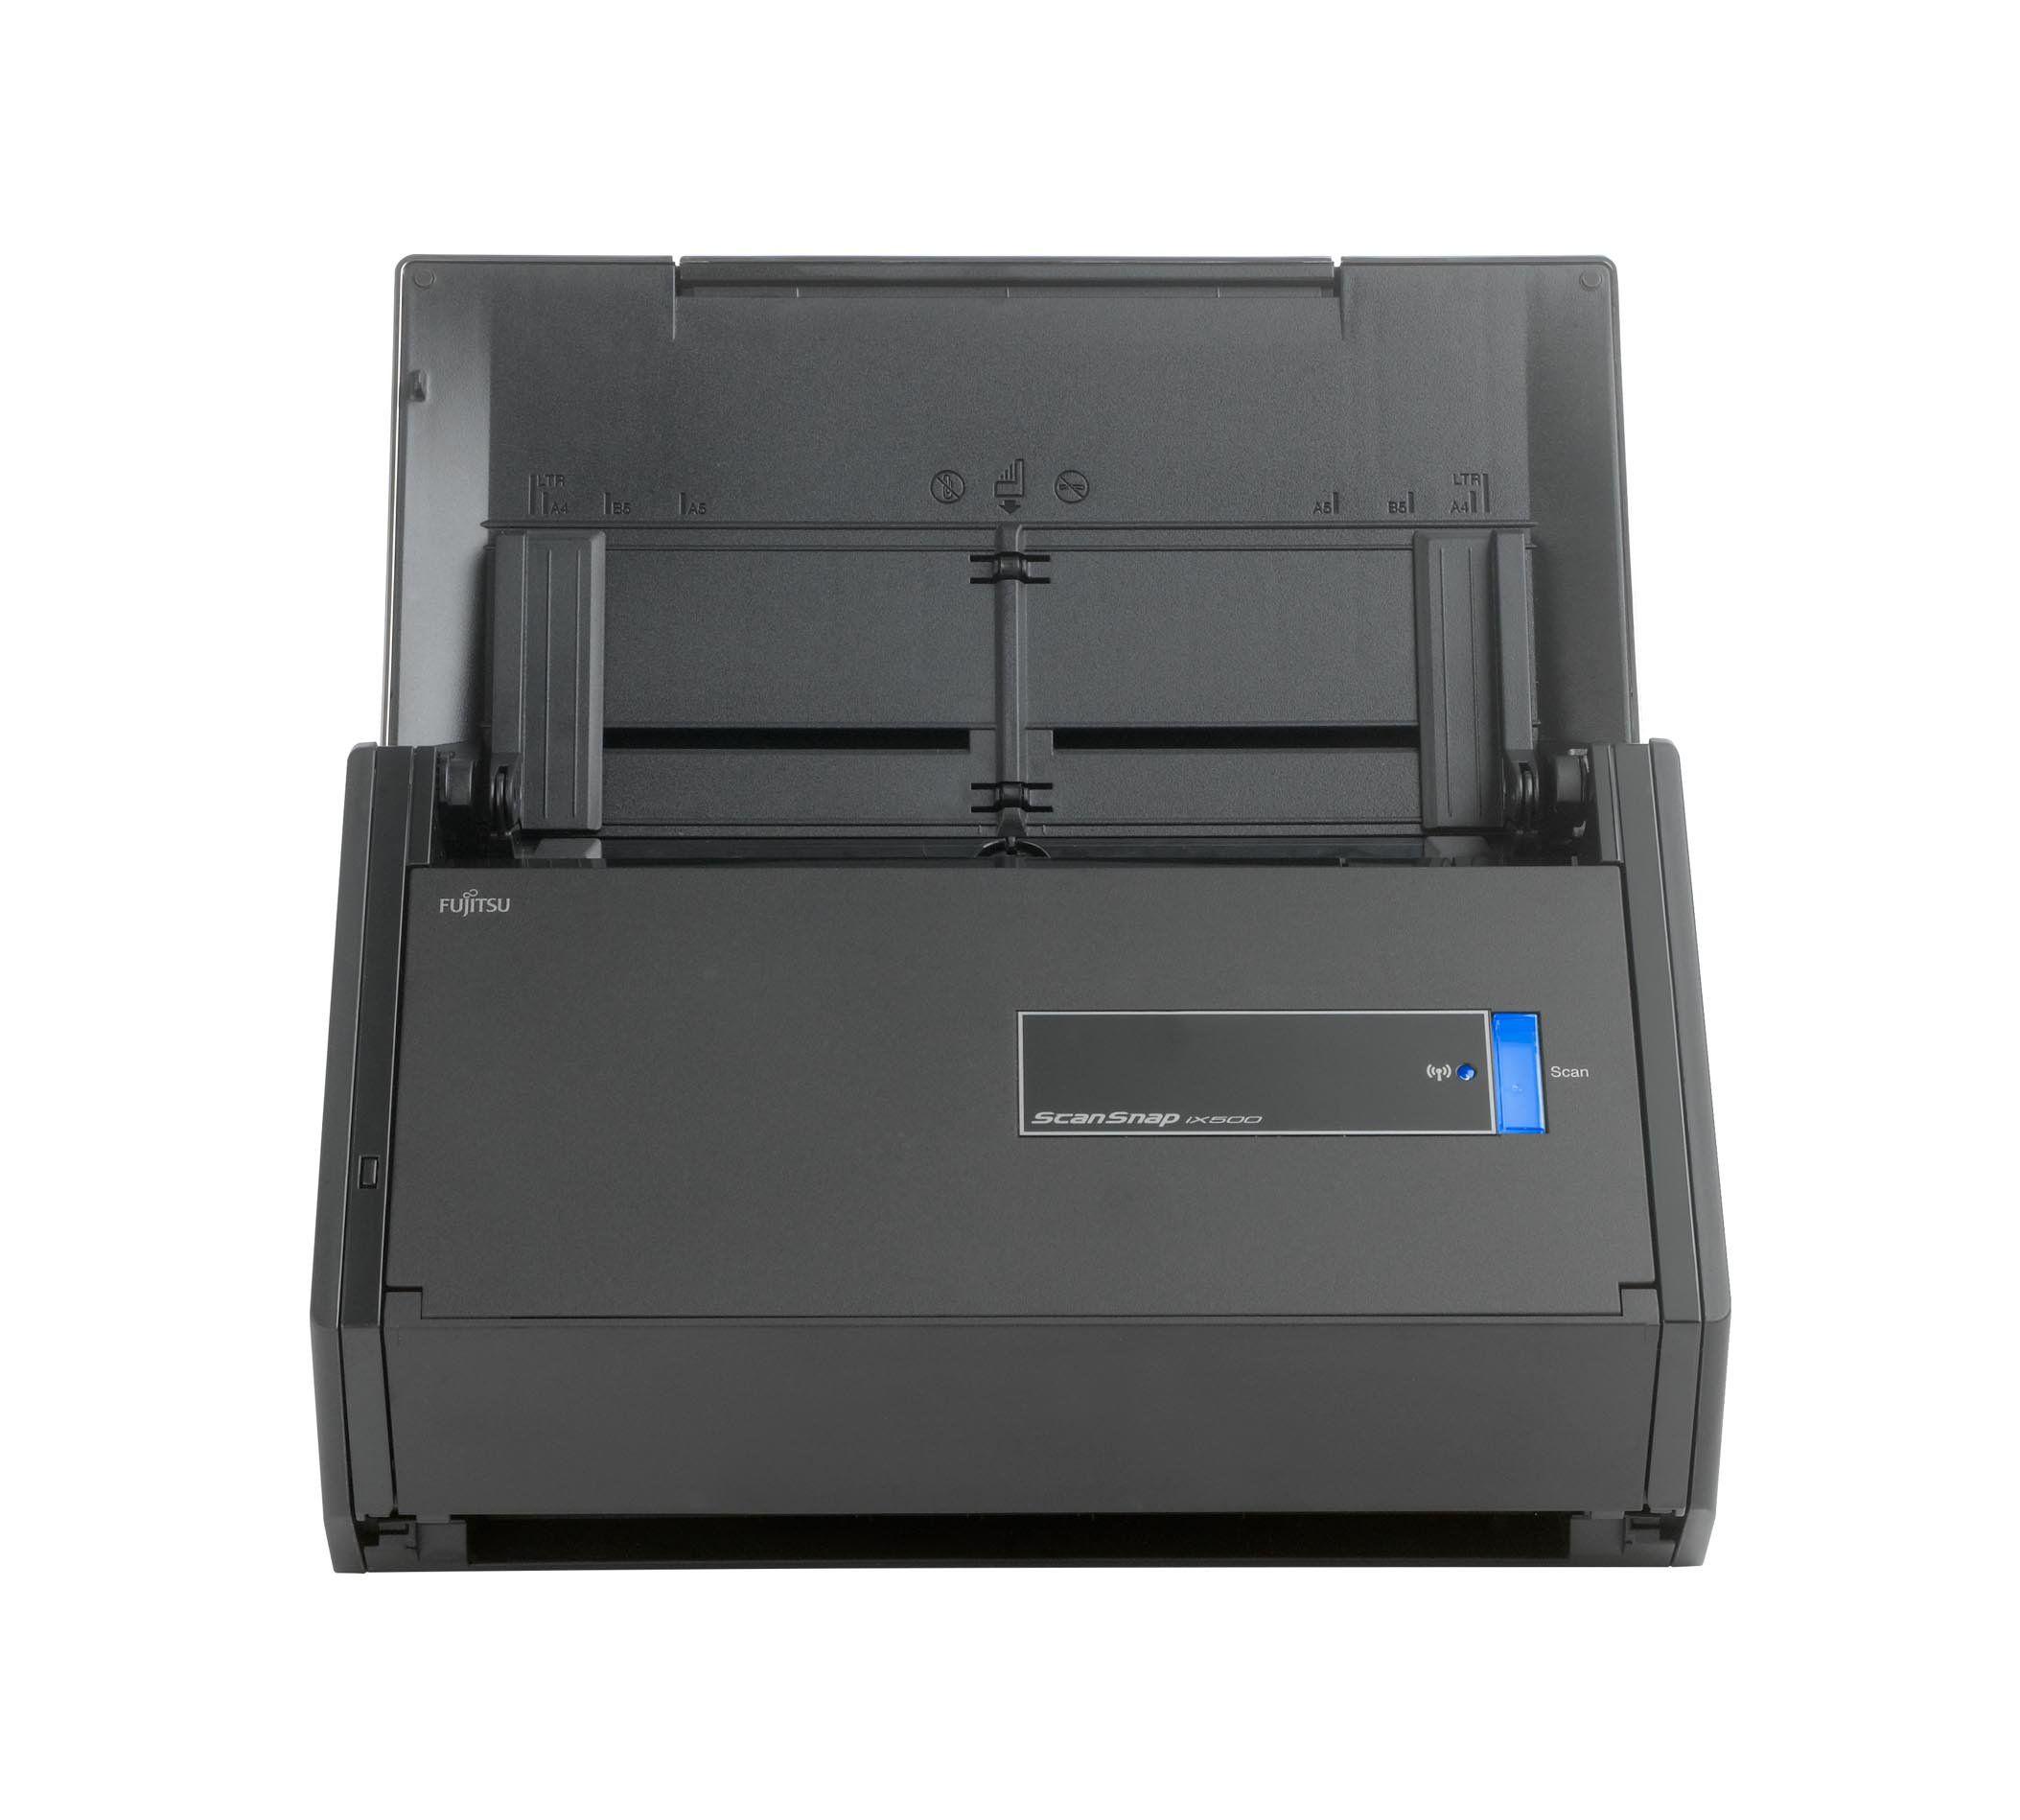 Fujitsu IX500 Scansnap Refurbished Document Scanner